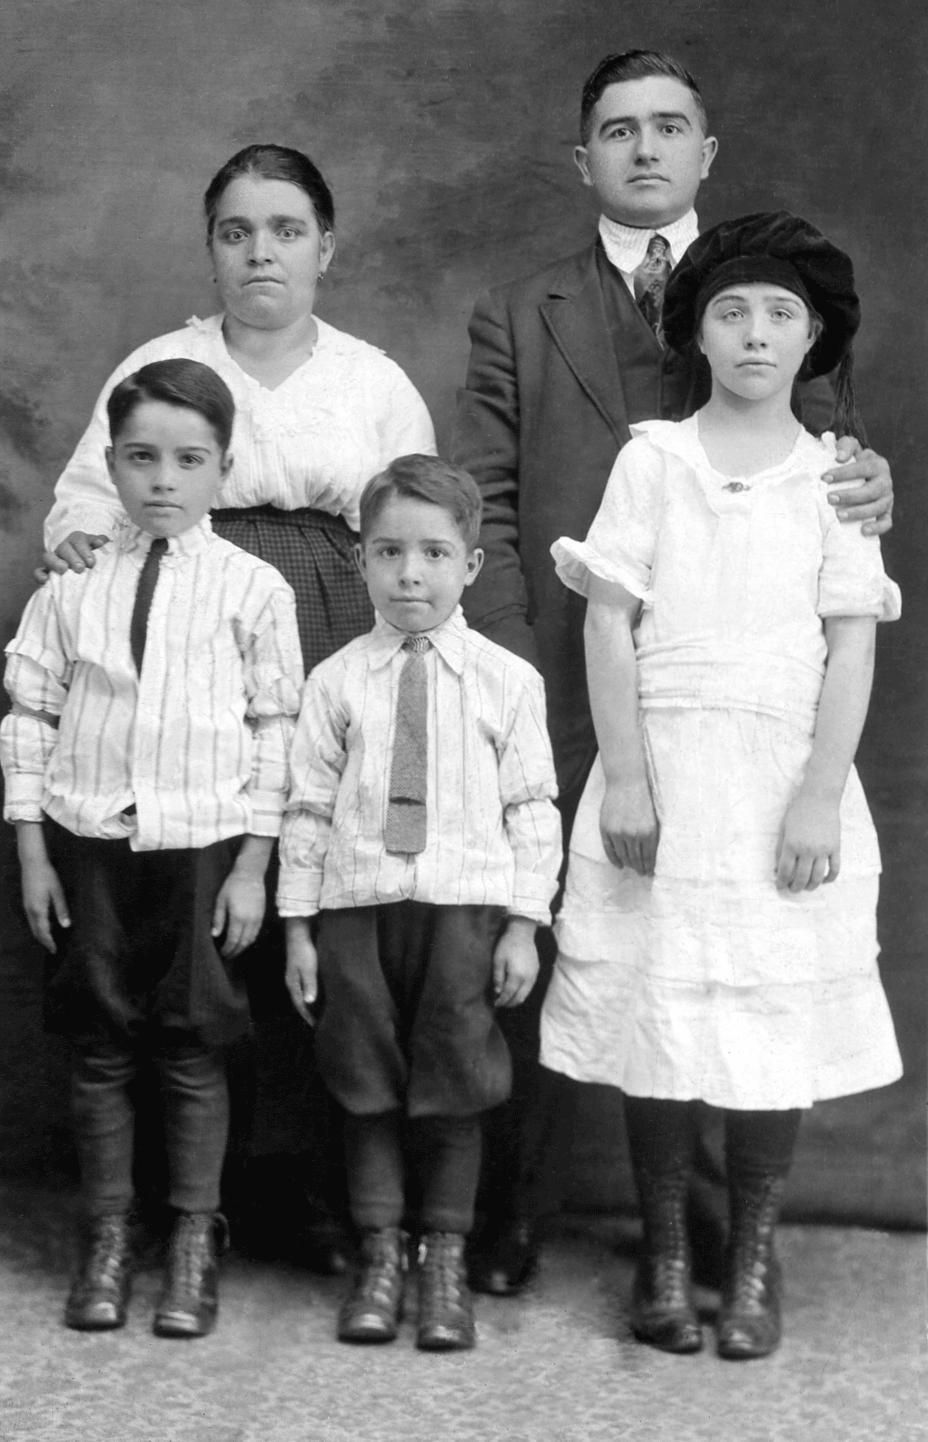 Minelli Family (c.1920)